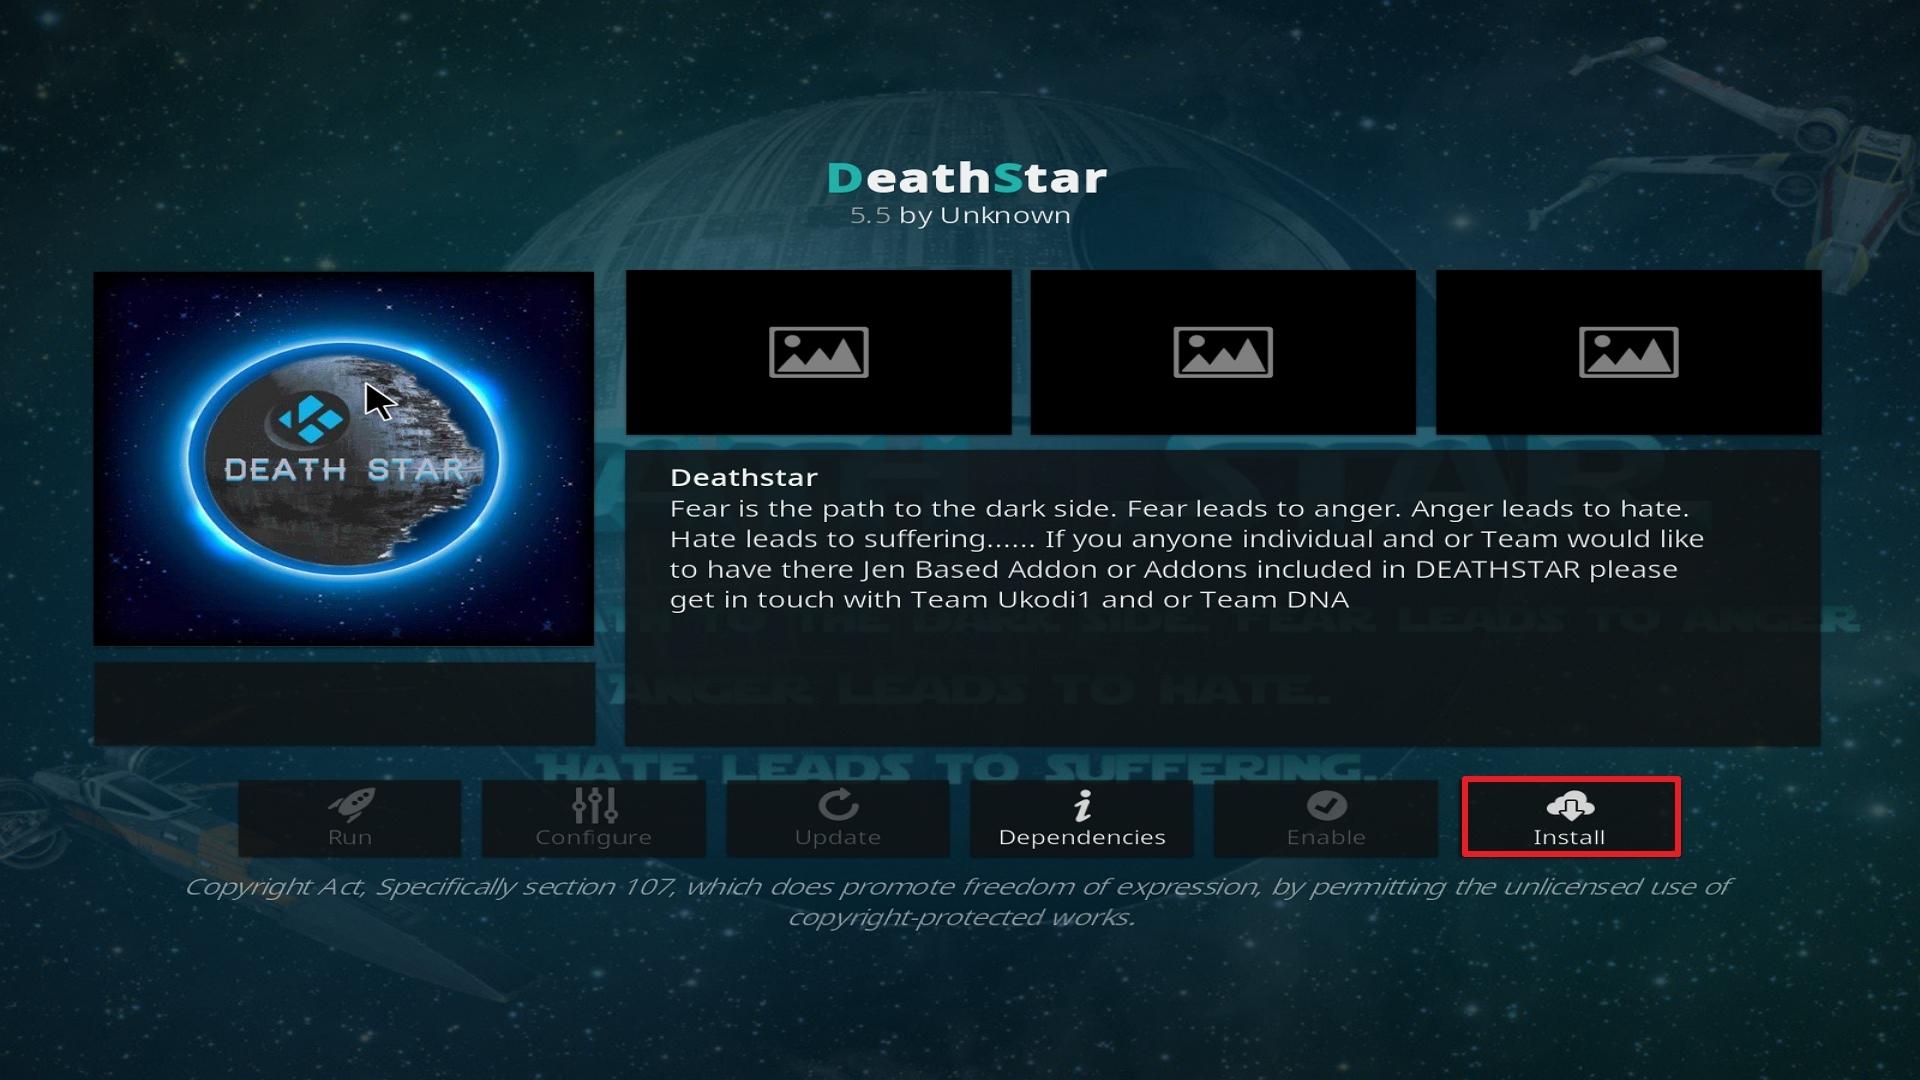 Destiny of Deathstar install step 23